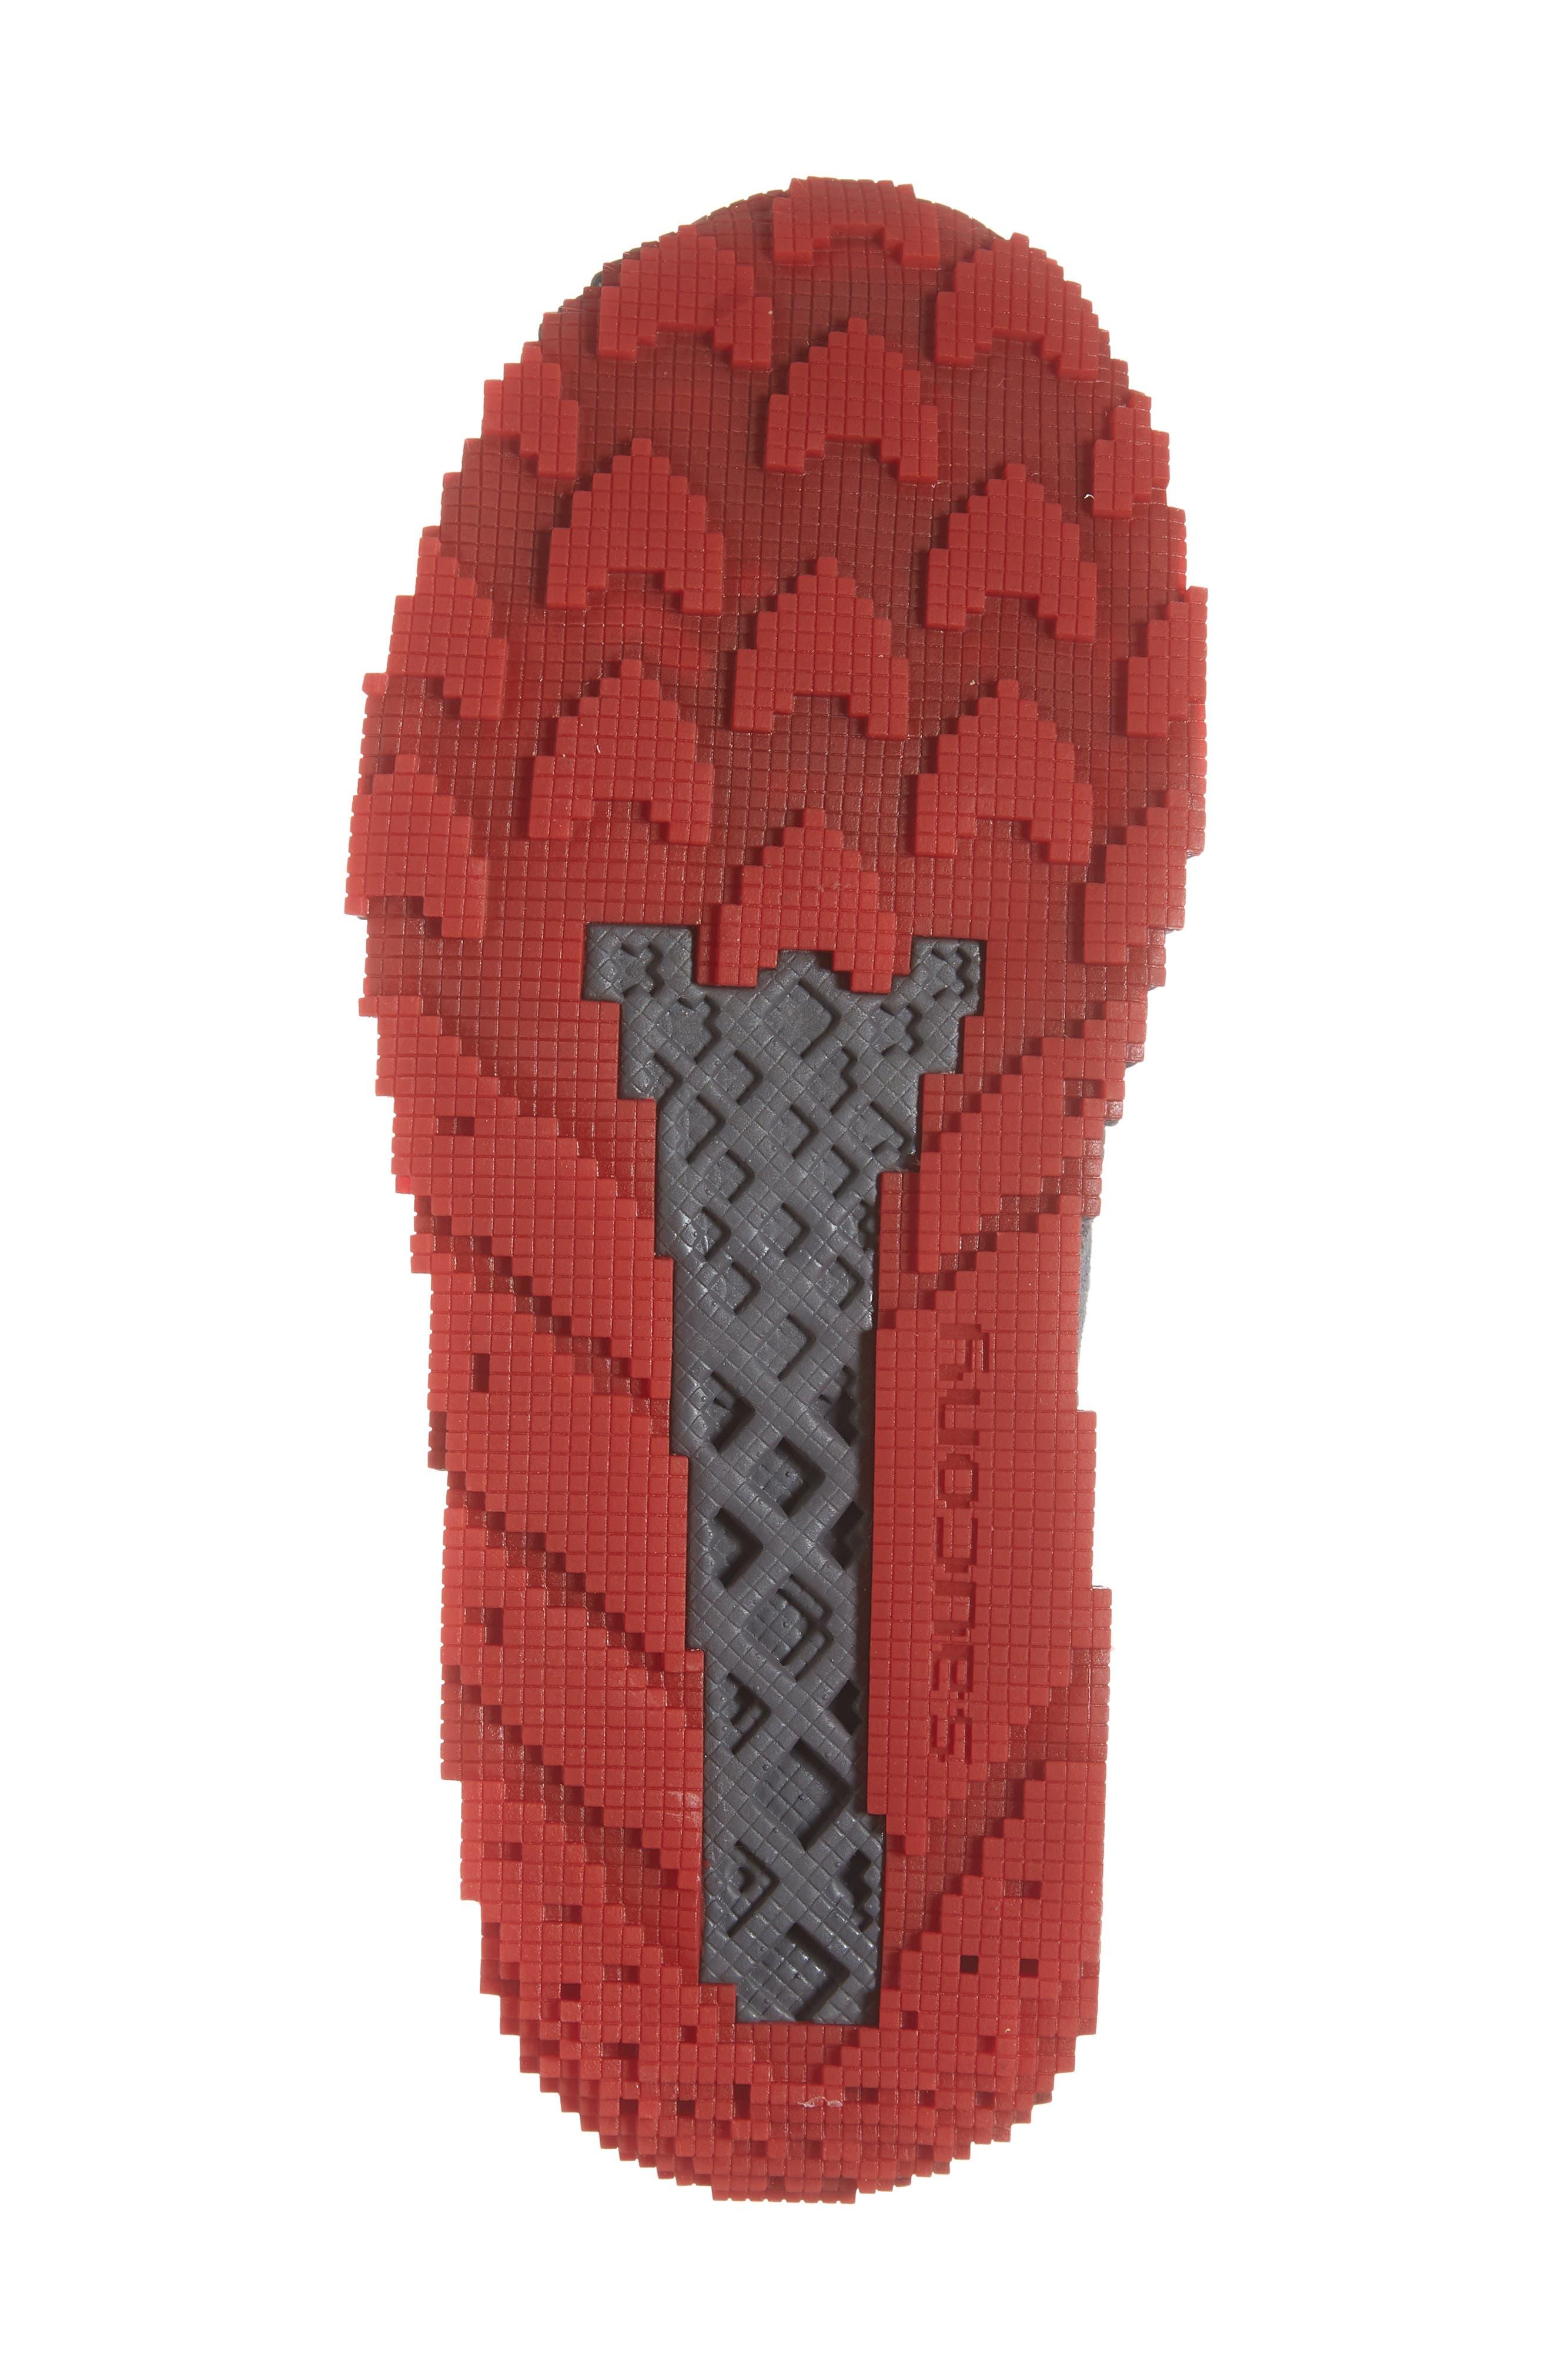 Voxel 9000 Sneaker,                             Alternate thumbnail 7, color,                             GREY LEATHER/ MESH 2